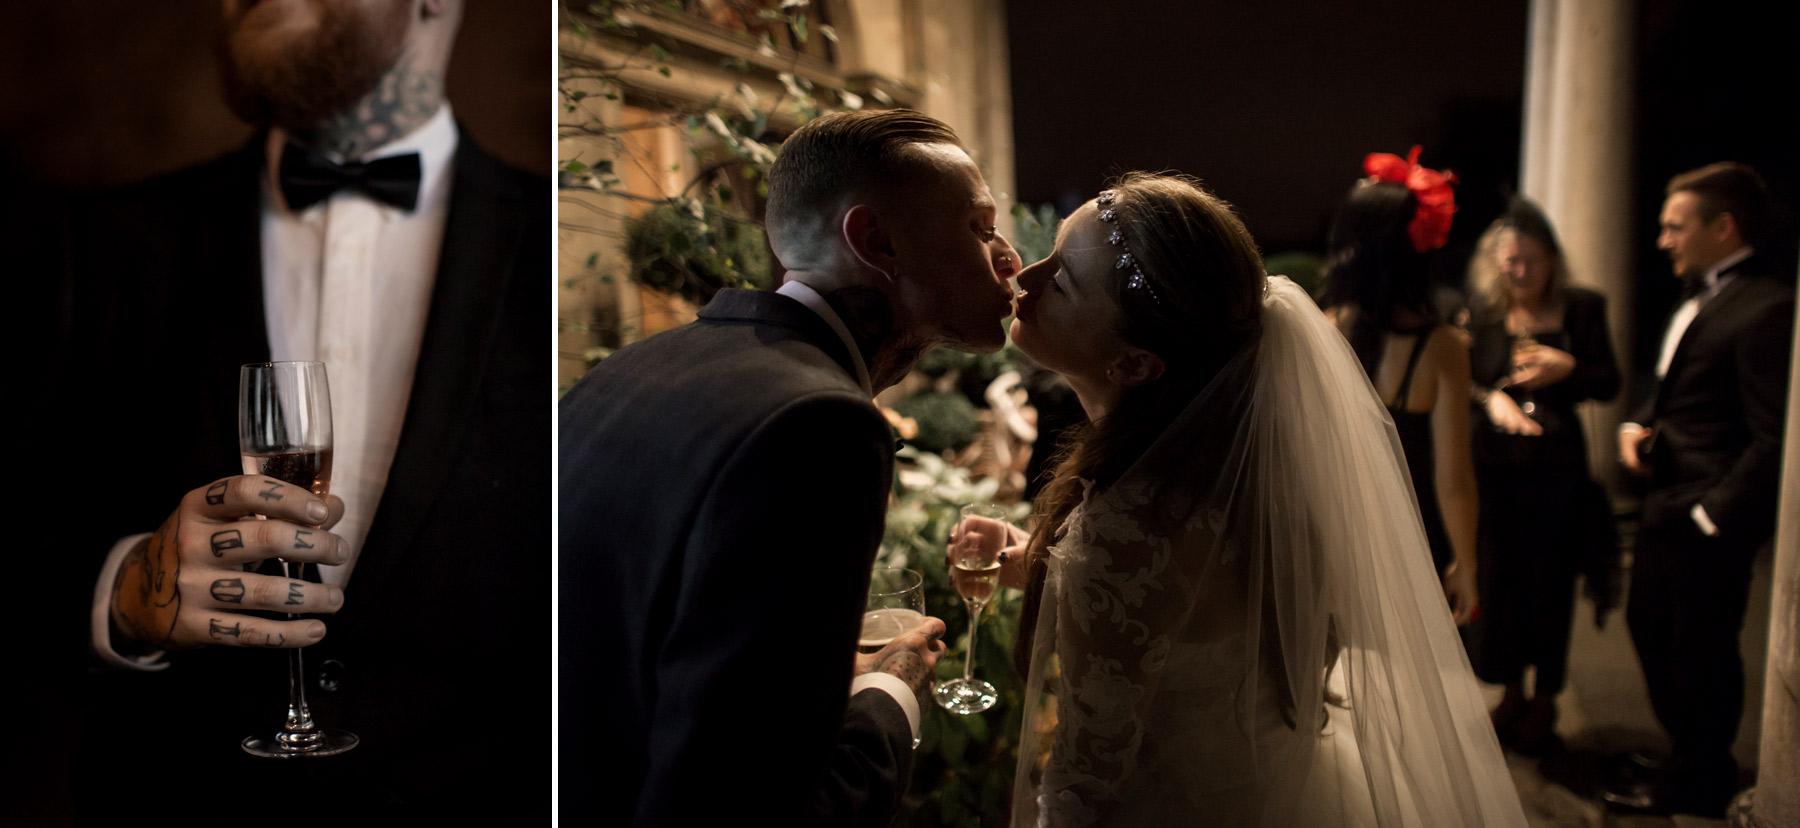 scottish winter wedding